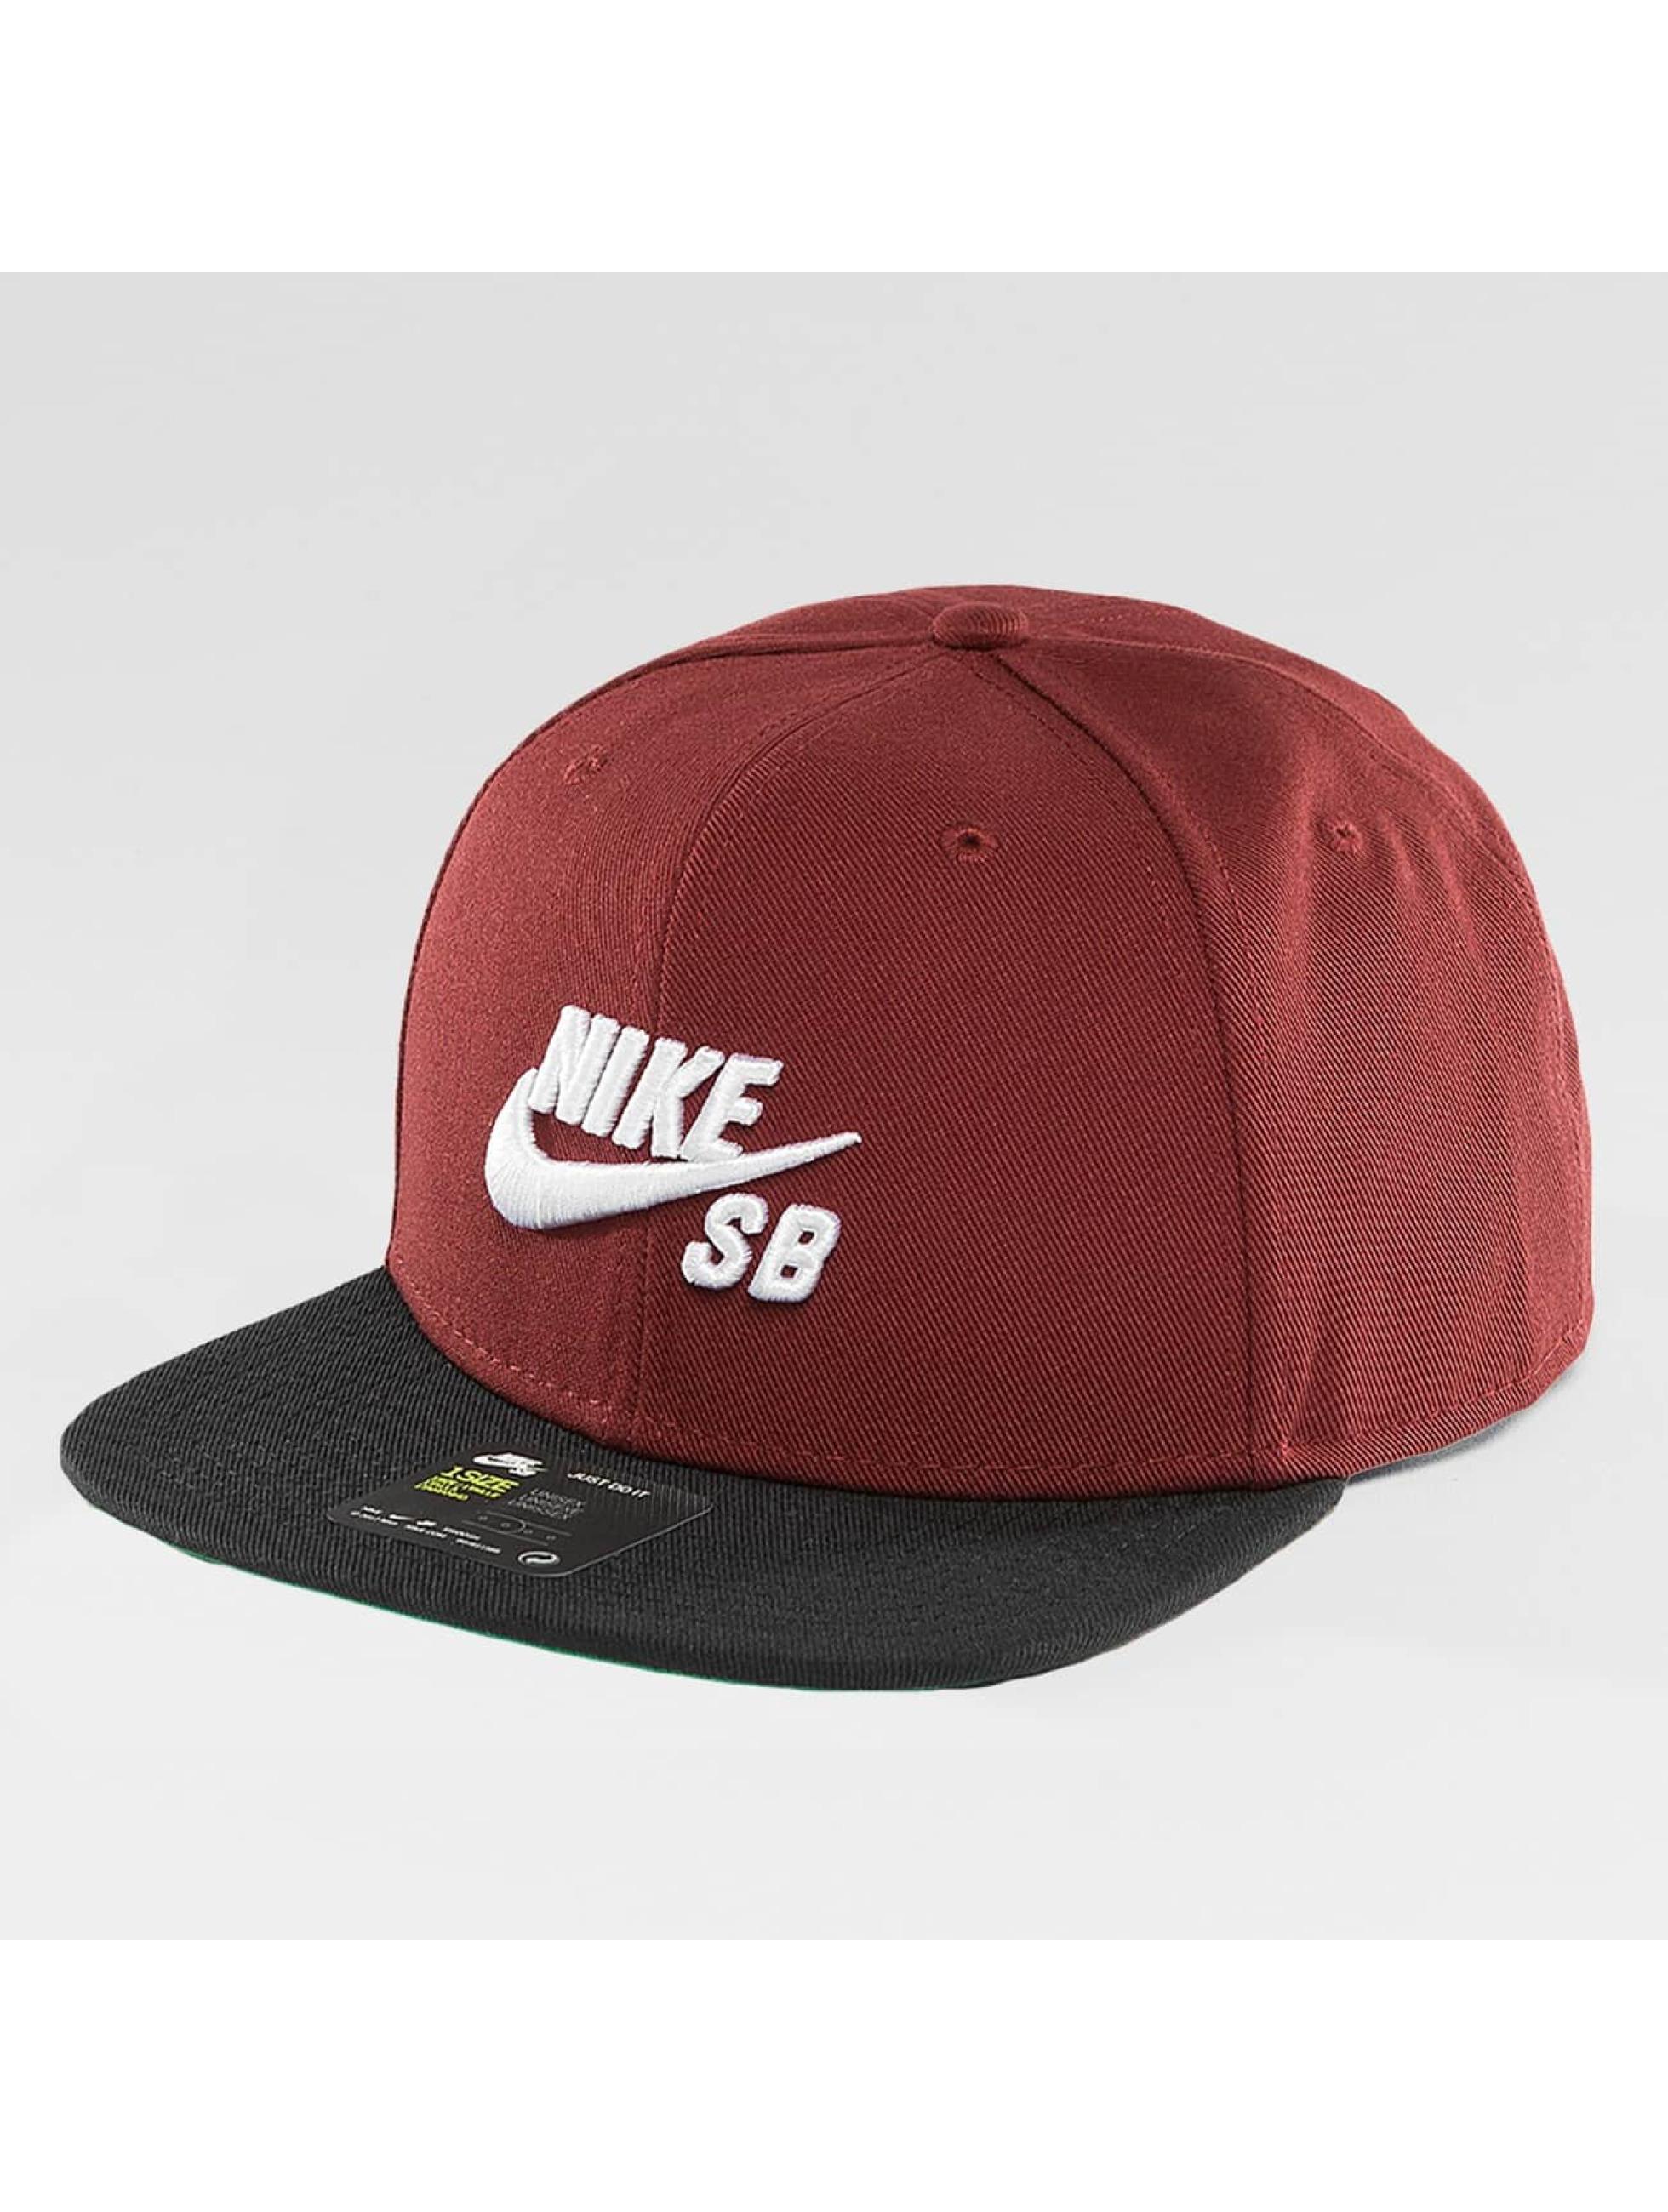 Nike SB Männer,Frauen Snapback Cap SB Icon in rot